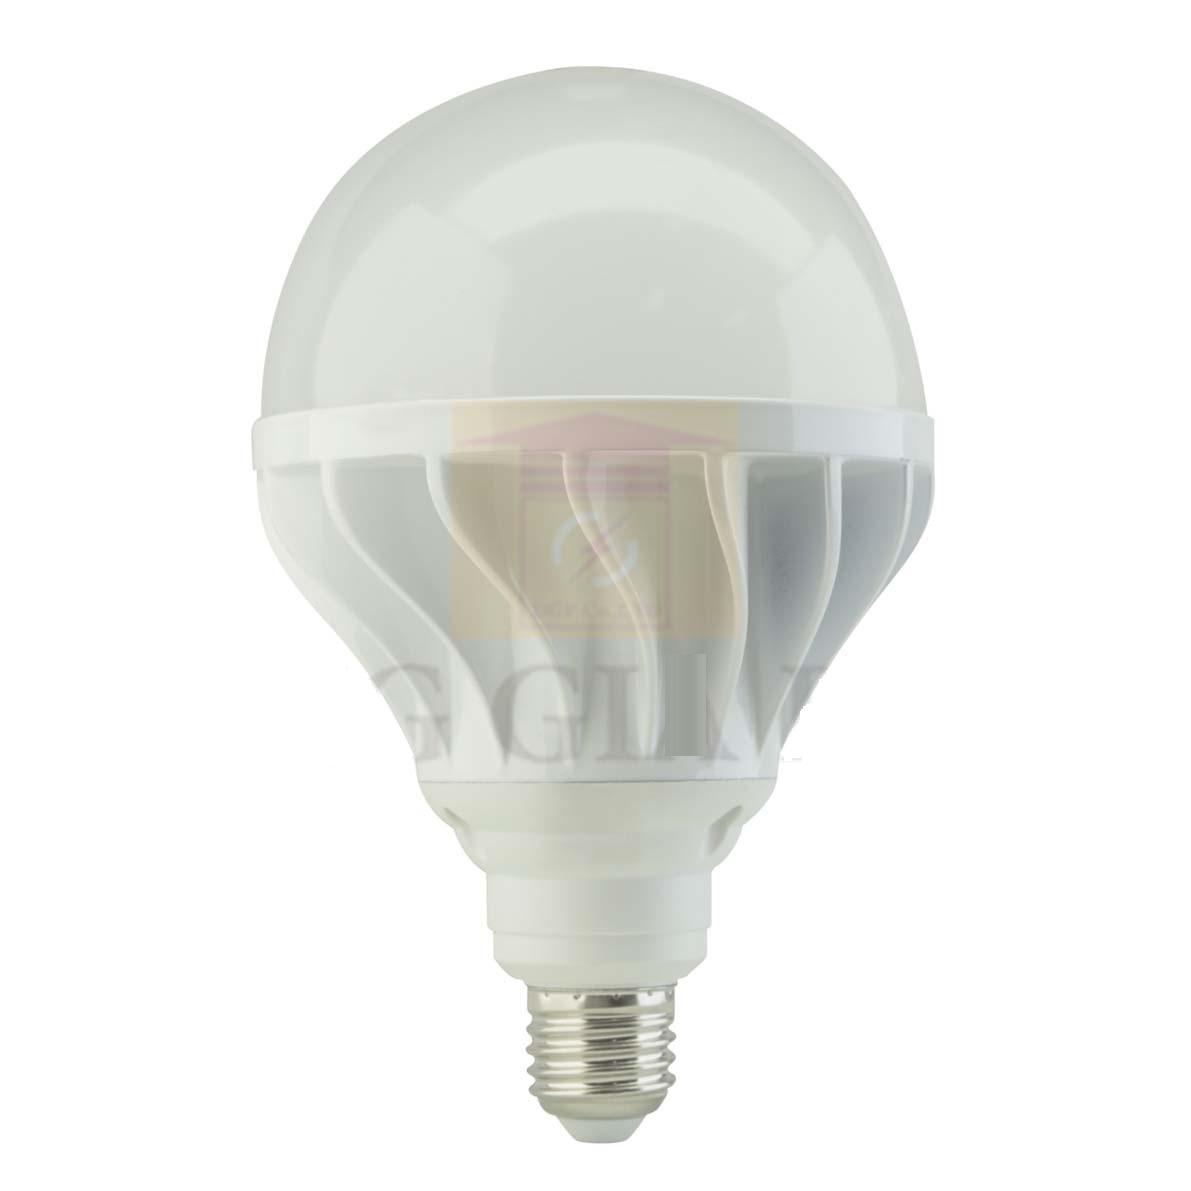 Bóng đèn led buld 40W LED A120/40W (S)